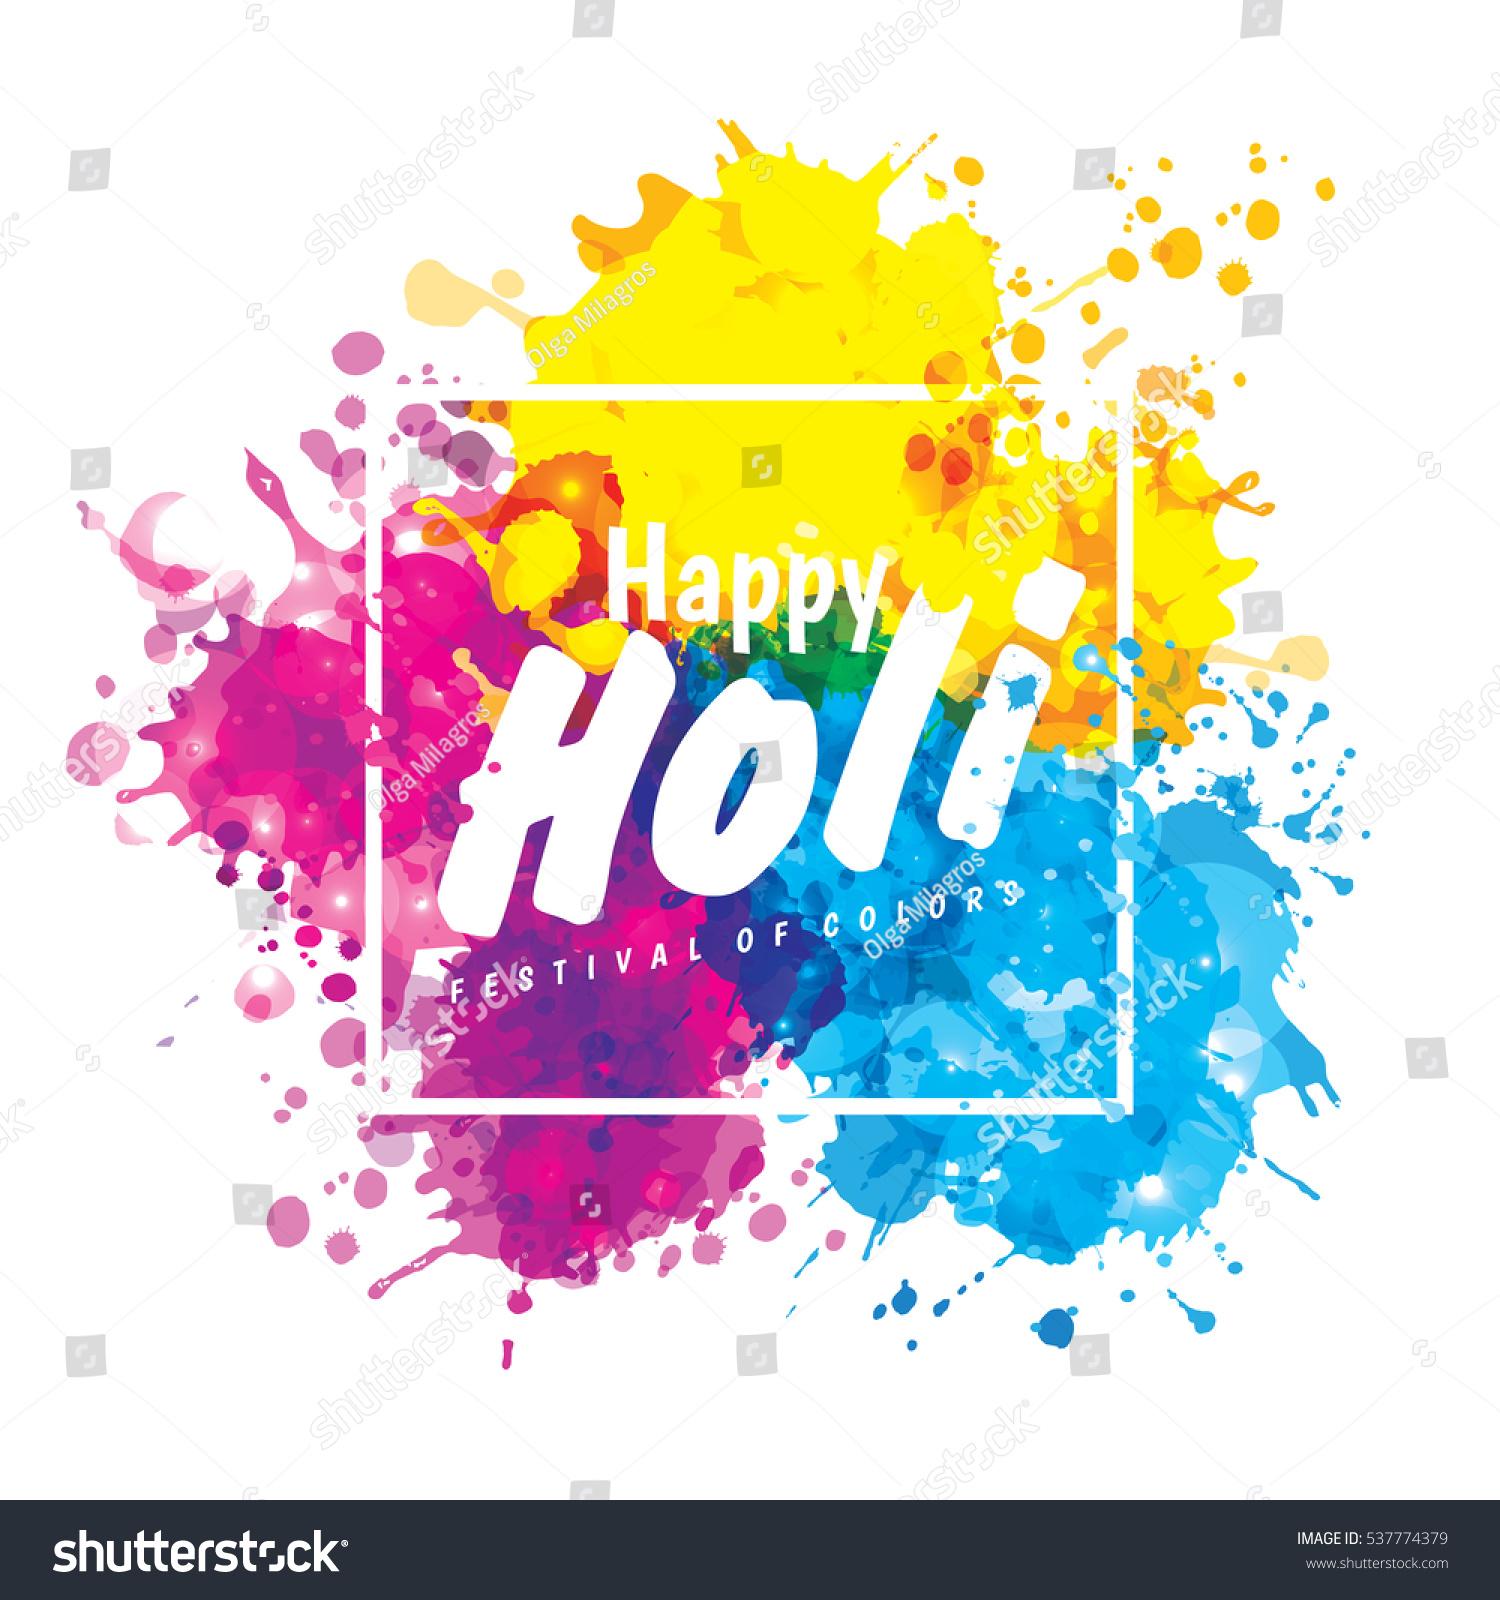 Holi Spring Festival Colors Design Element Stock Illustration